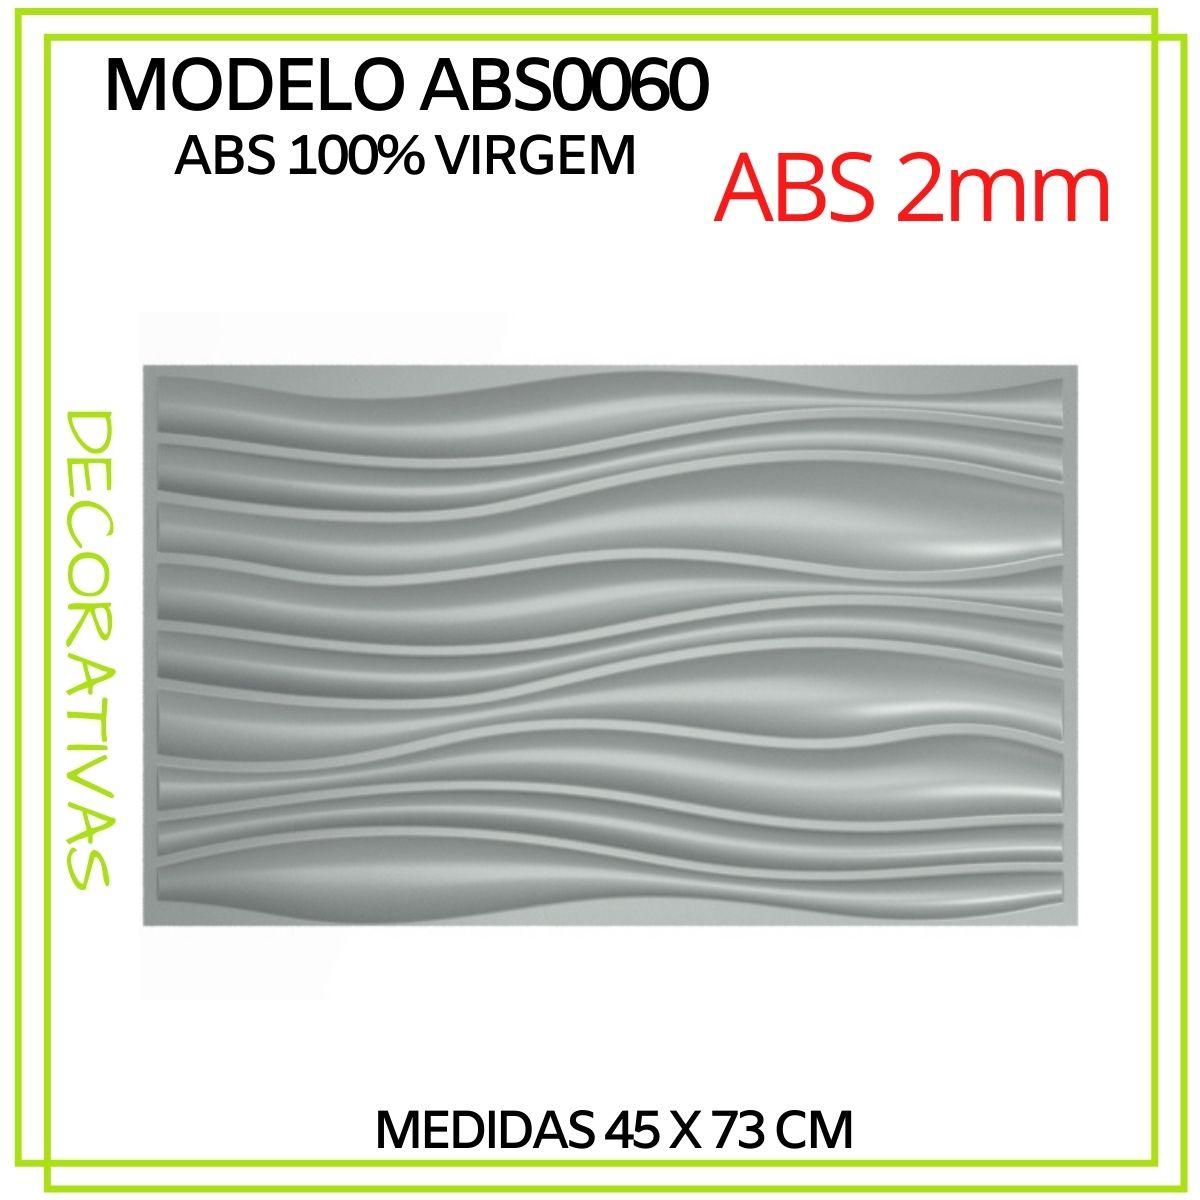 Forma De Gesso 3D em ABS - ABS0060-2MM 45x73cm